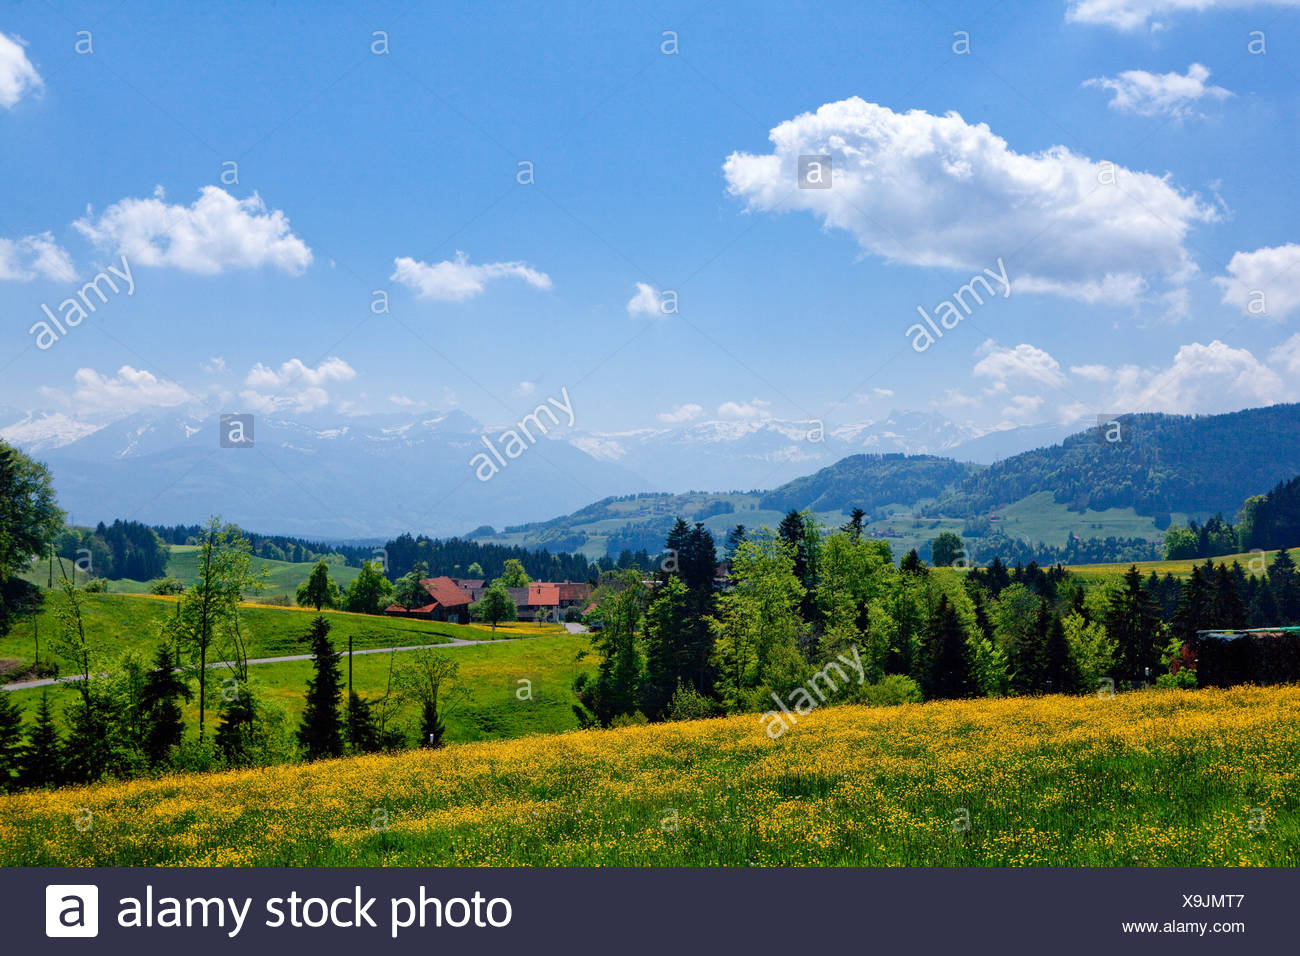 Switzerland zurich landscape spring scenery stock photos for Innendekoration pfaffikon zh